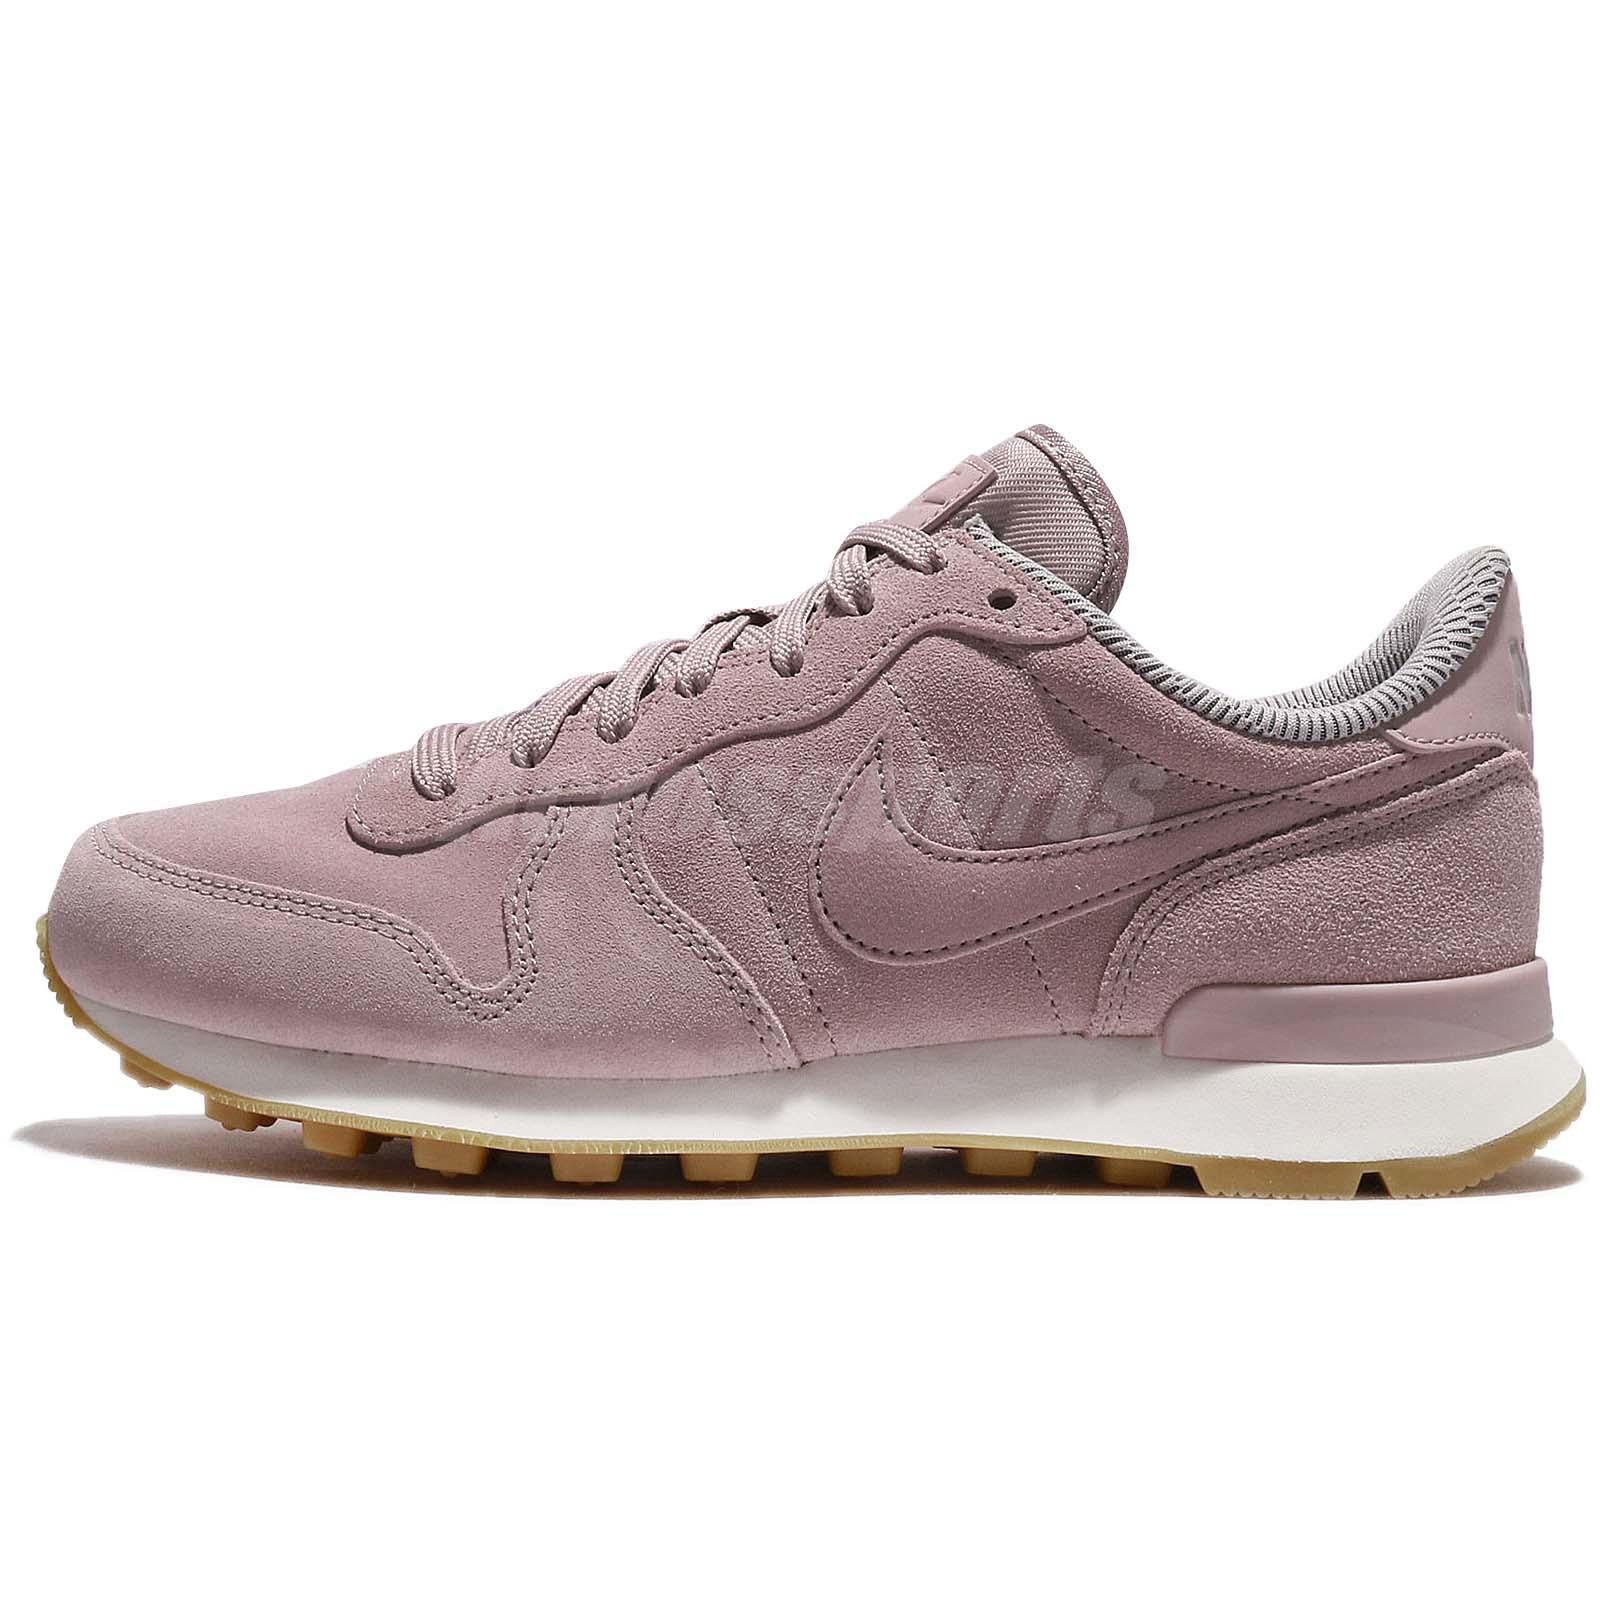 f45d14f6dc1 Nike Wmns Internationalist SE Particle Rose Purple Gum Women Running  872922-602